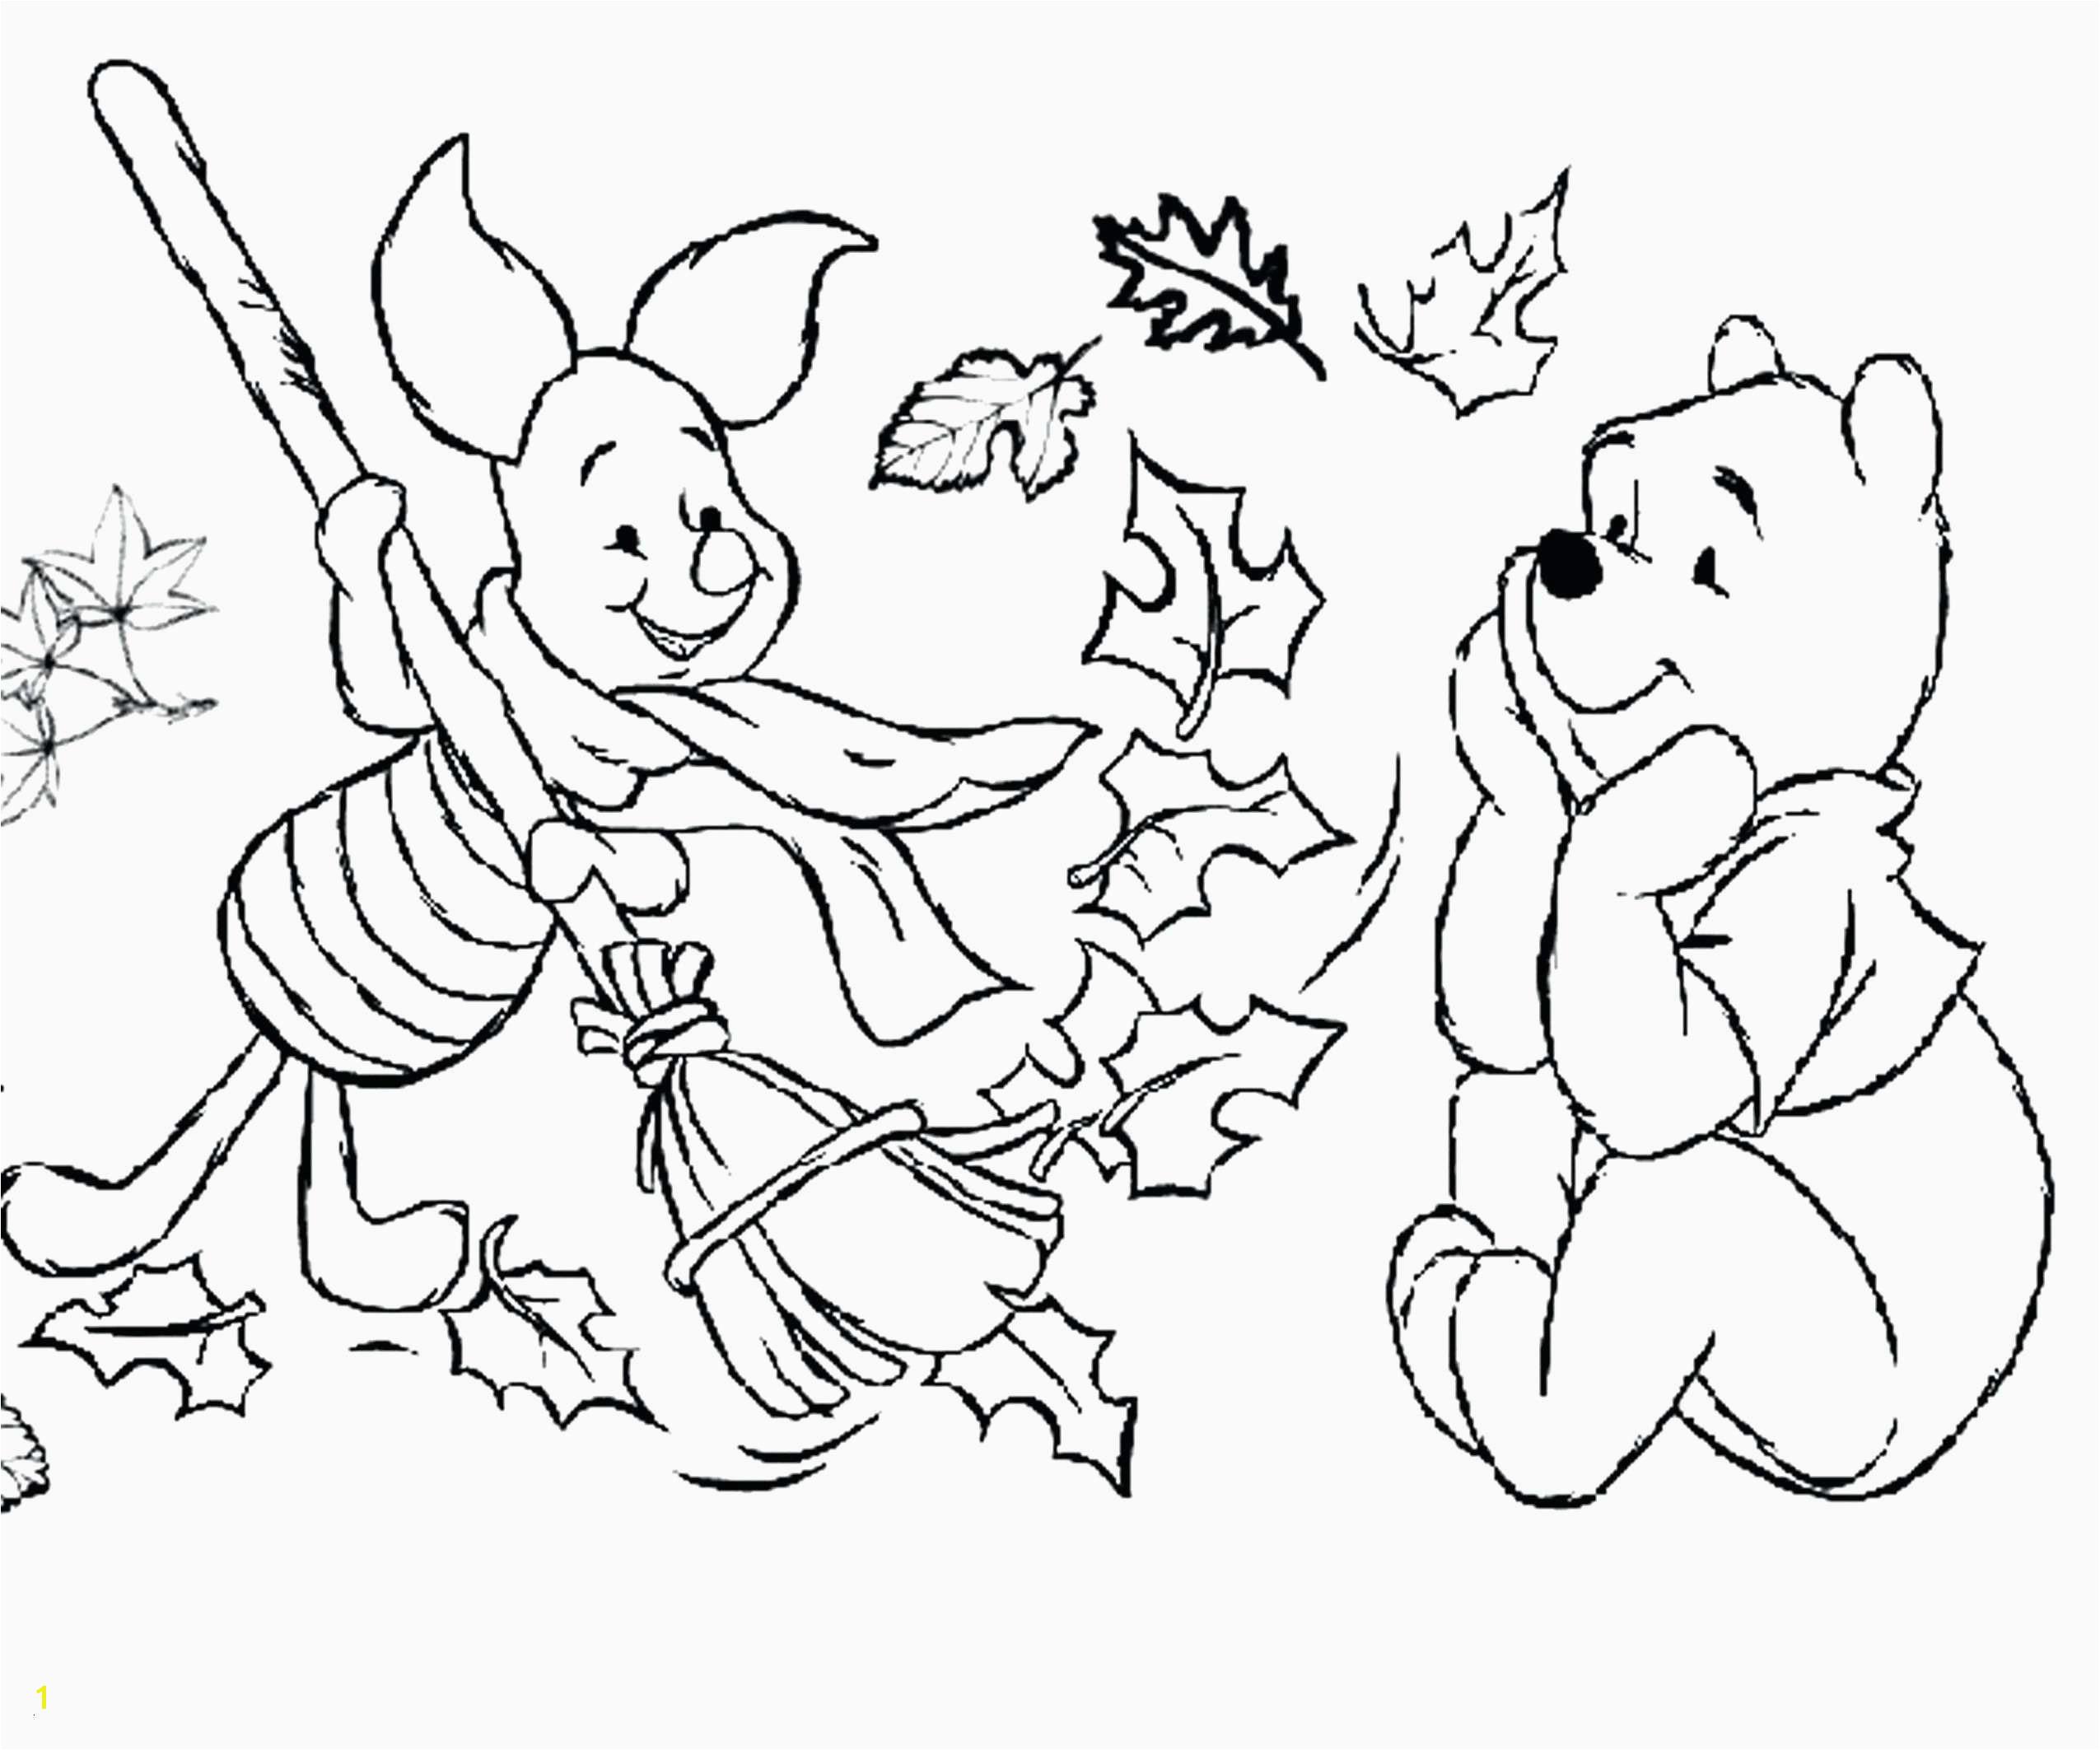 Malvorlagen Tinkerbell Einzigartig Tinkerbell Christmas Coloring regarding Dinotrux Malvorlage